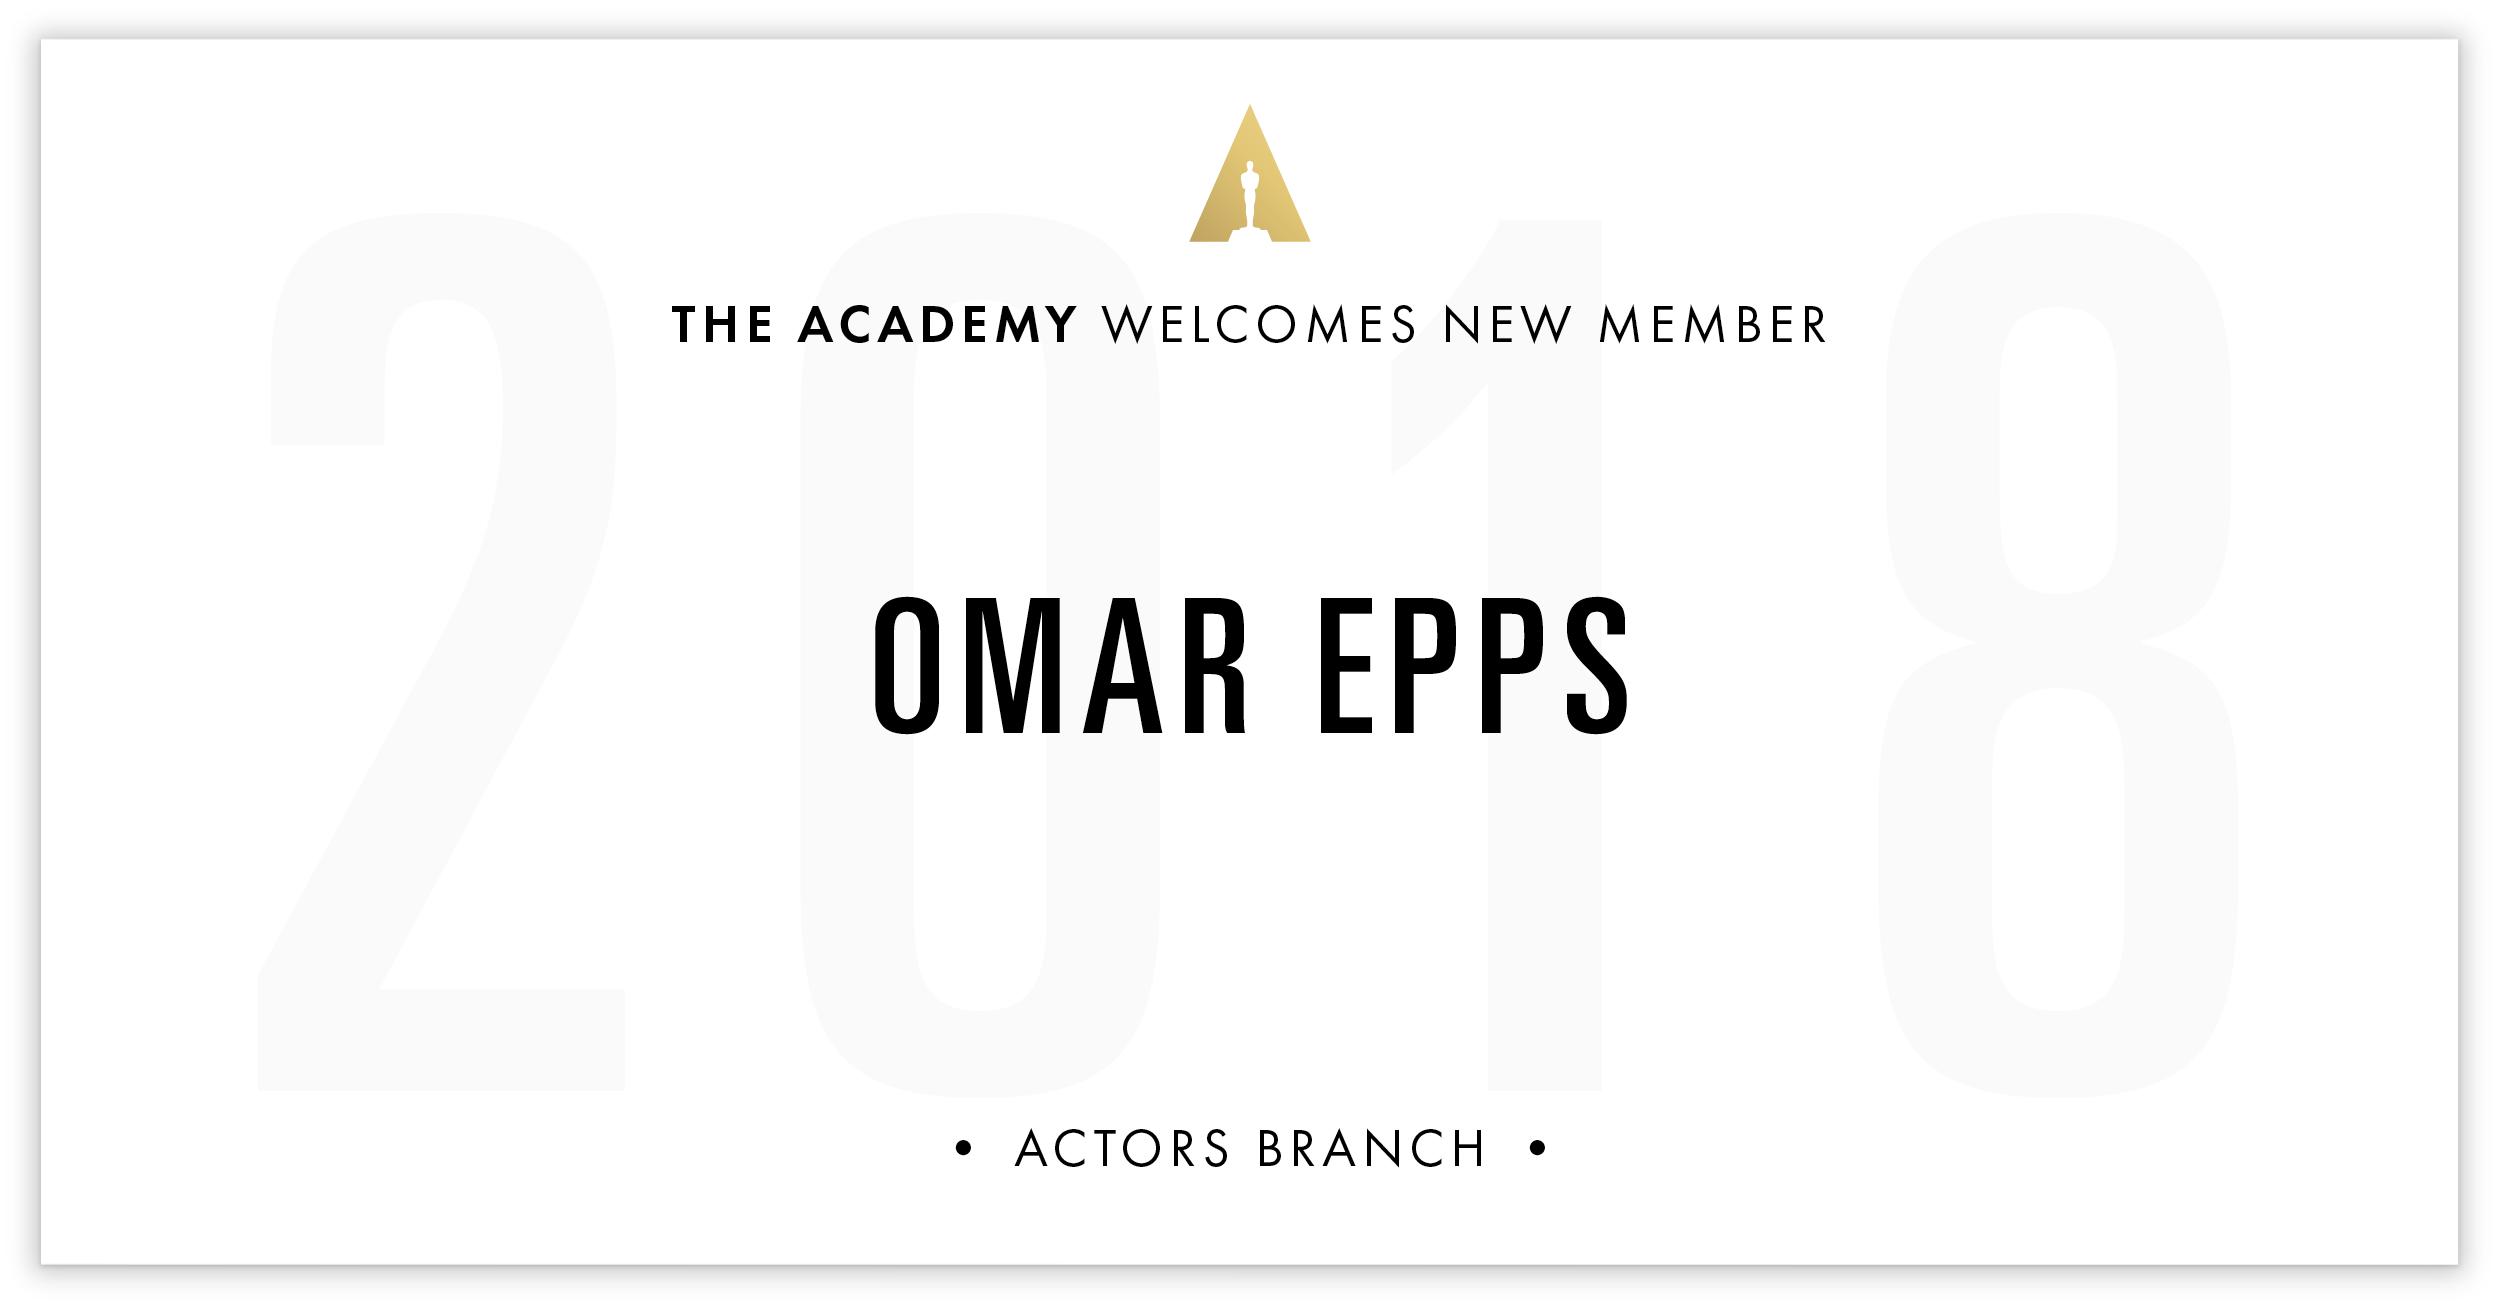 Omar Epps is invited!